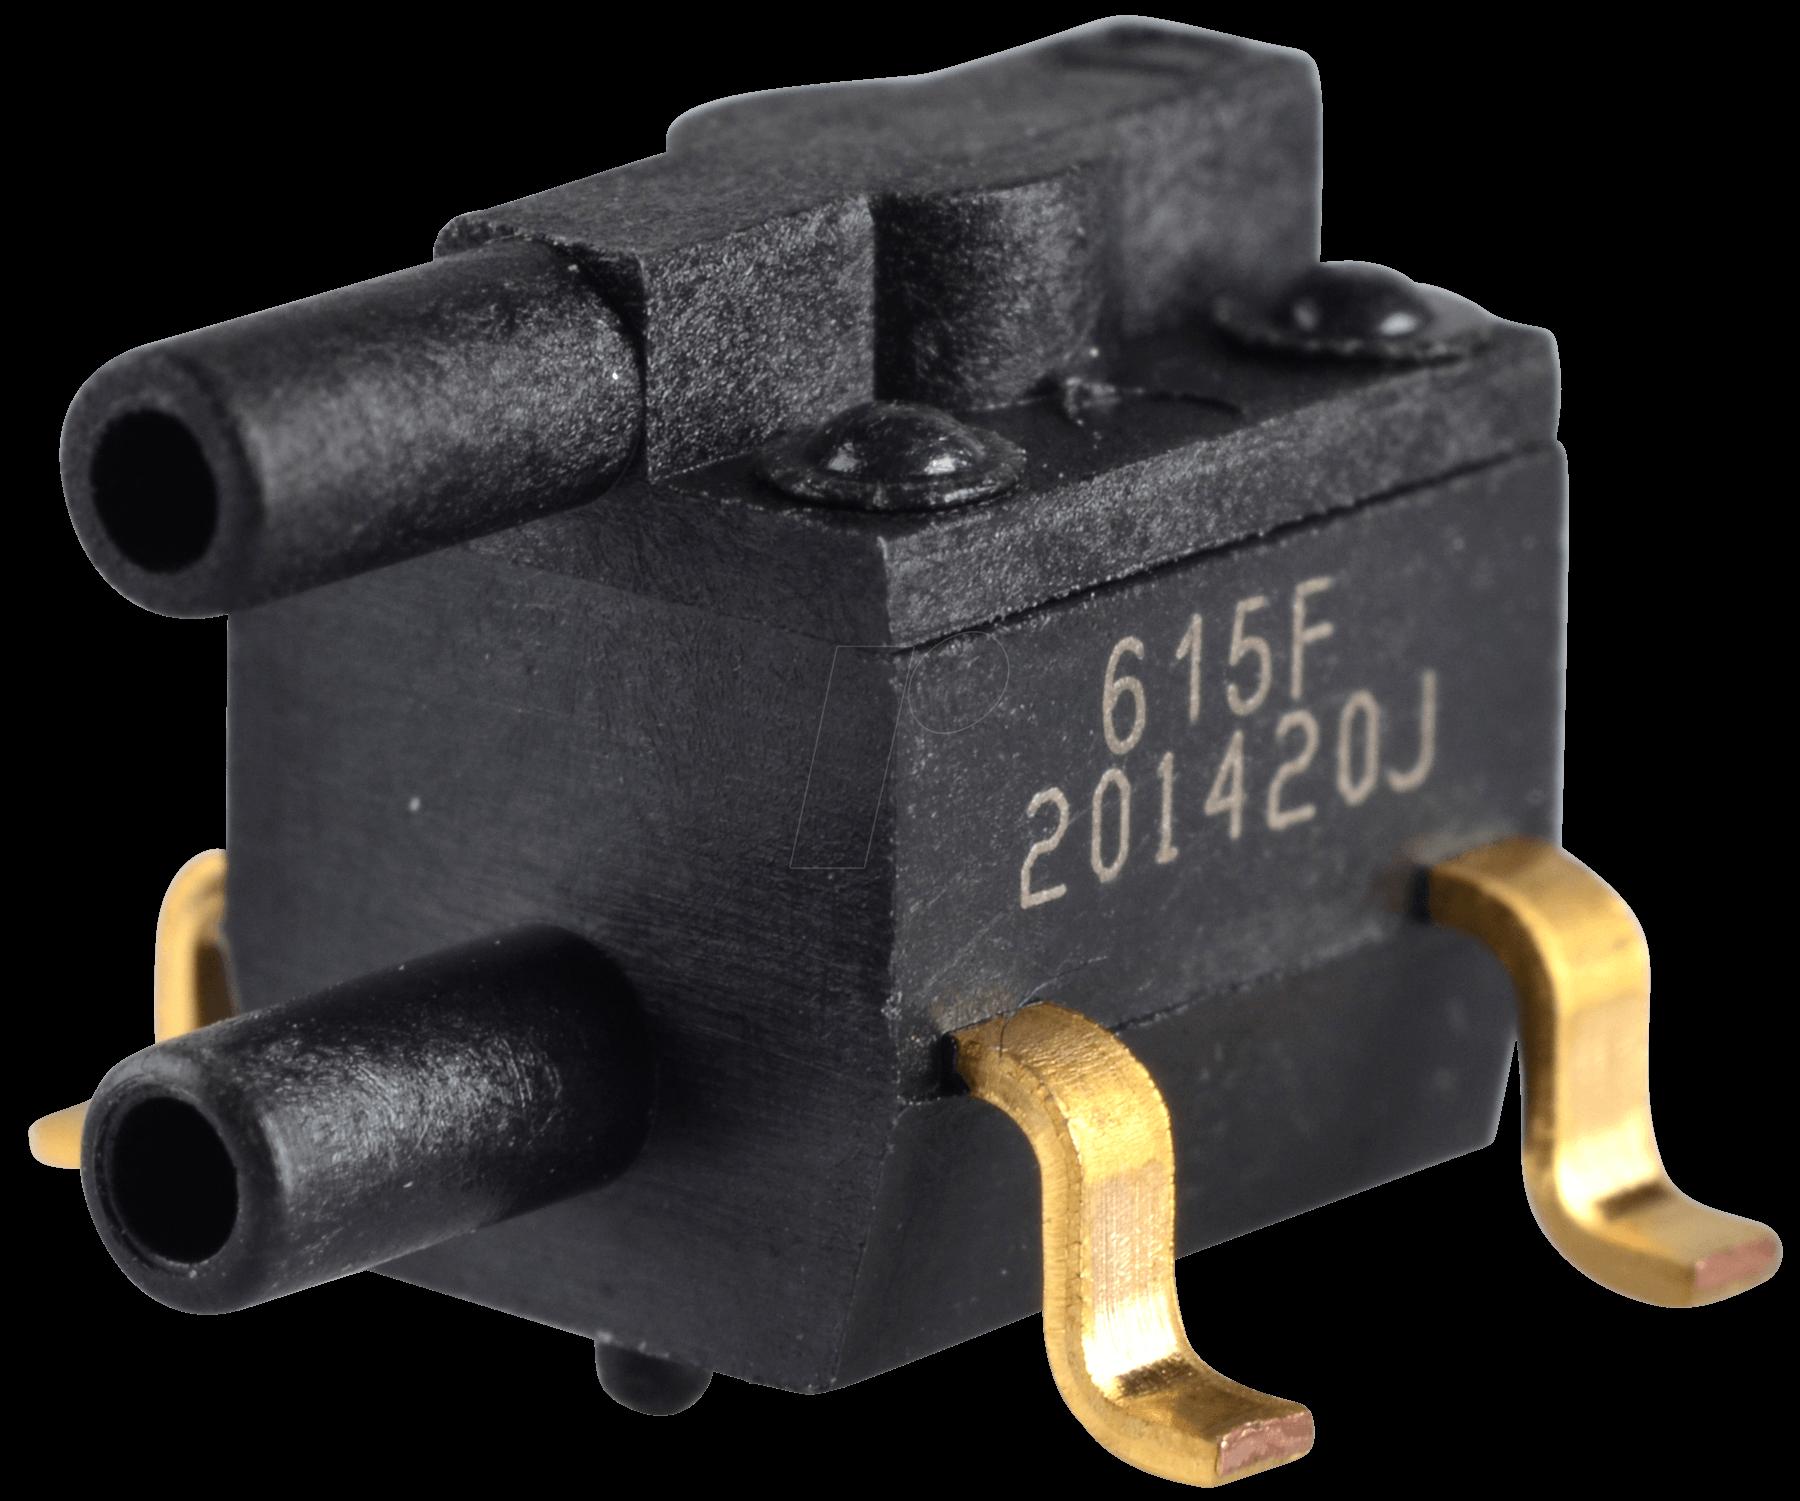 26 PC15 SMT - Differenzdrucksensor, SMD, relativ, ± 15 psi